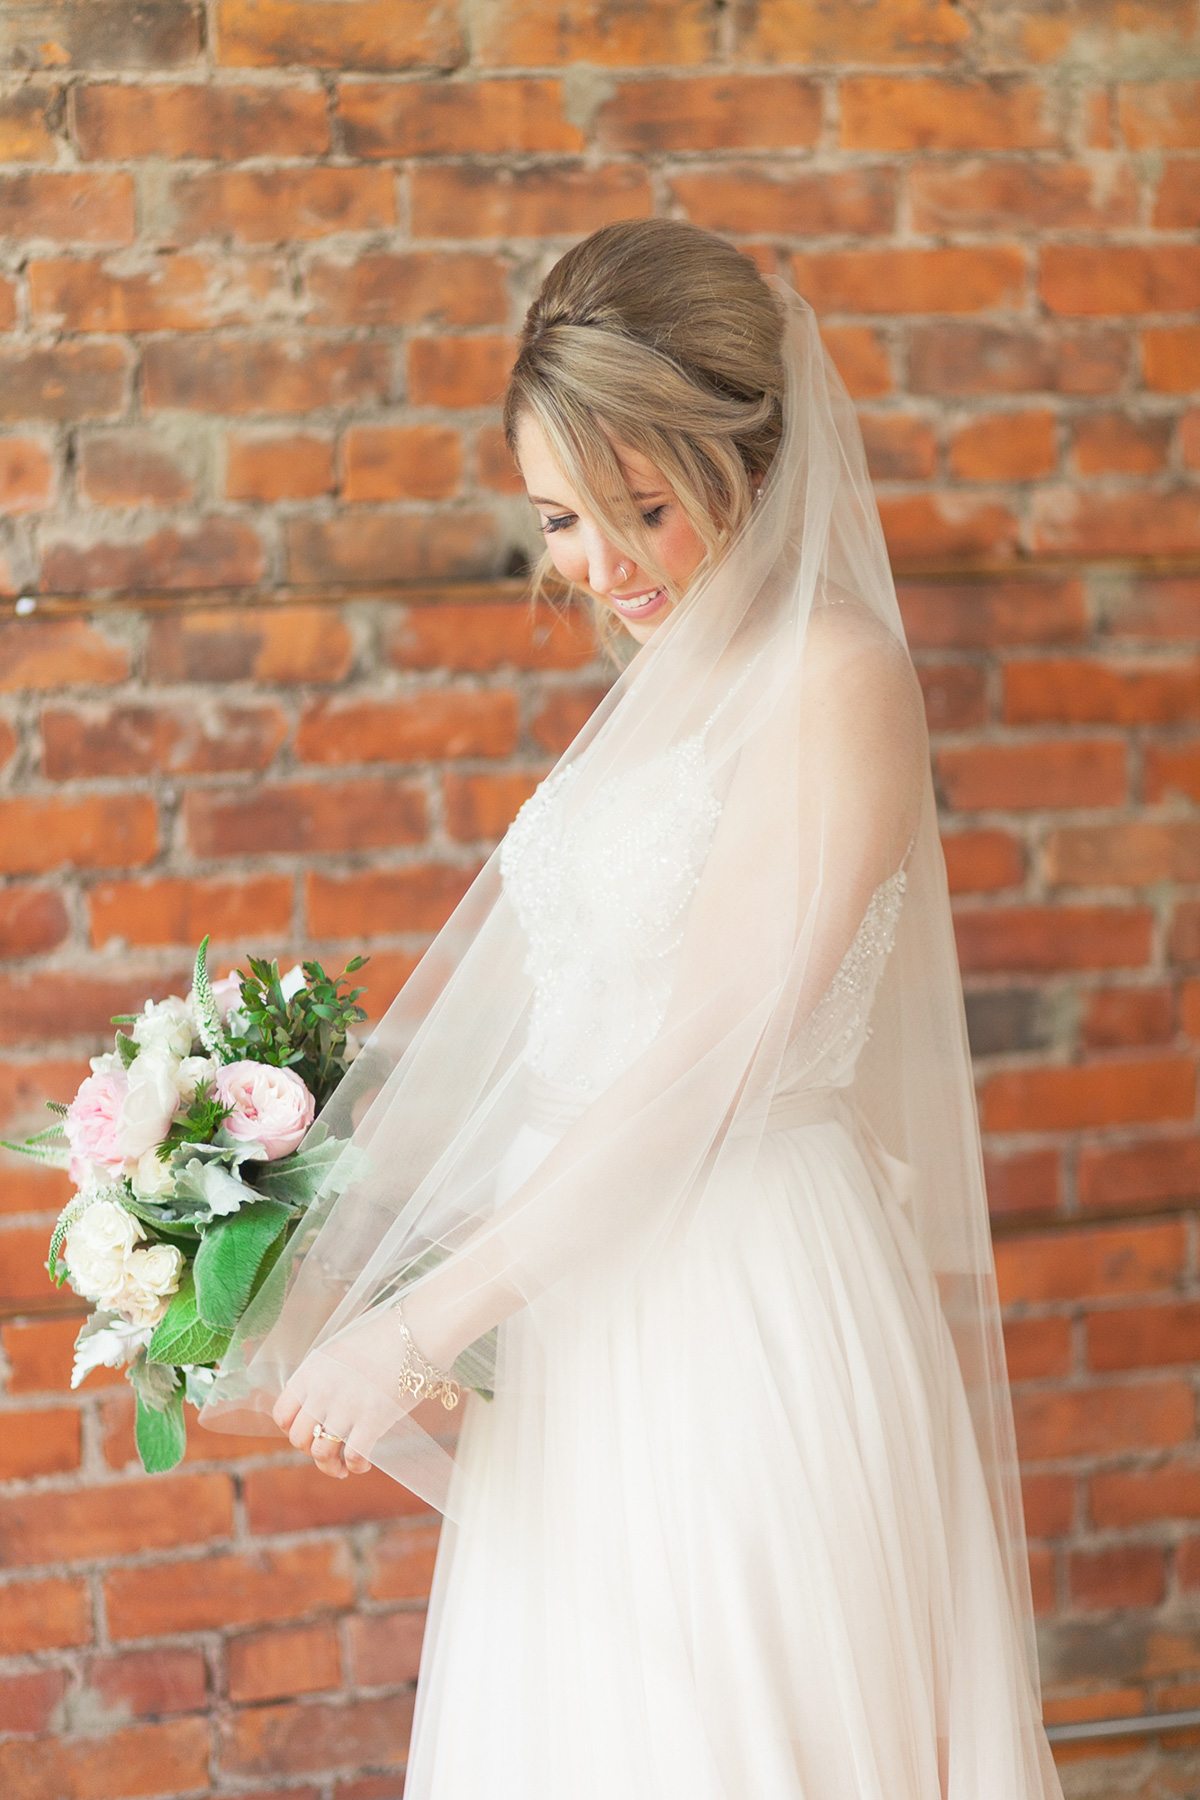 jennifer-xu-photography-vineyard-bride-swish-list-spice-factory-hamilton-wedding-19.jpg